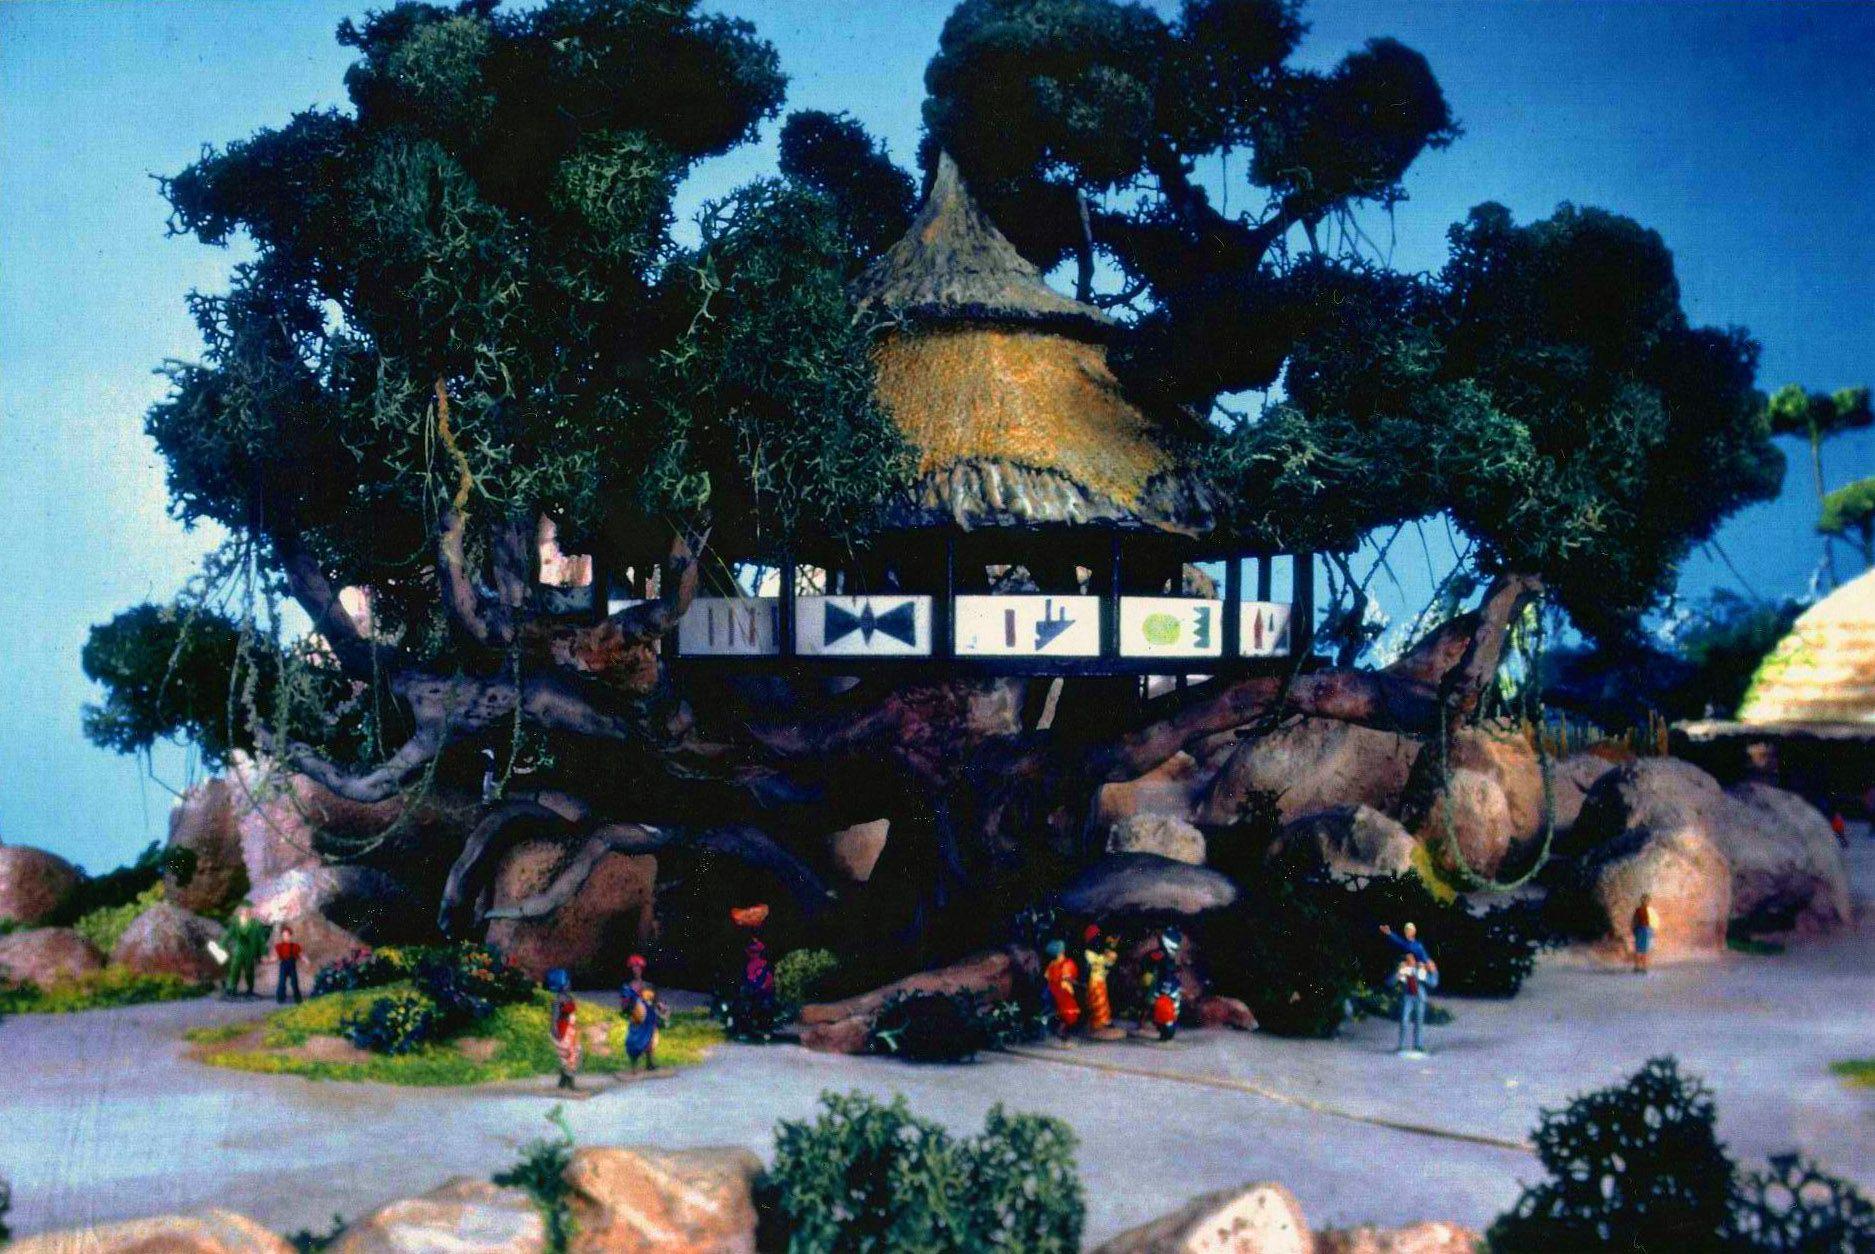 Treehouse Epcot Center' Equatorial Africa Pavilion Model Kenya Disney Concept